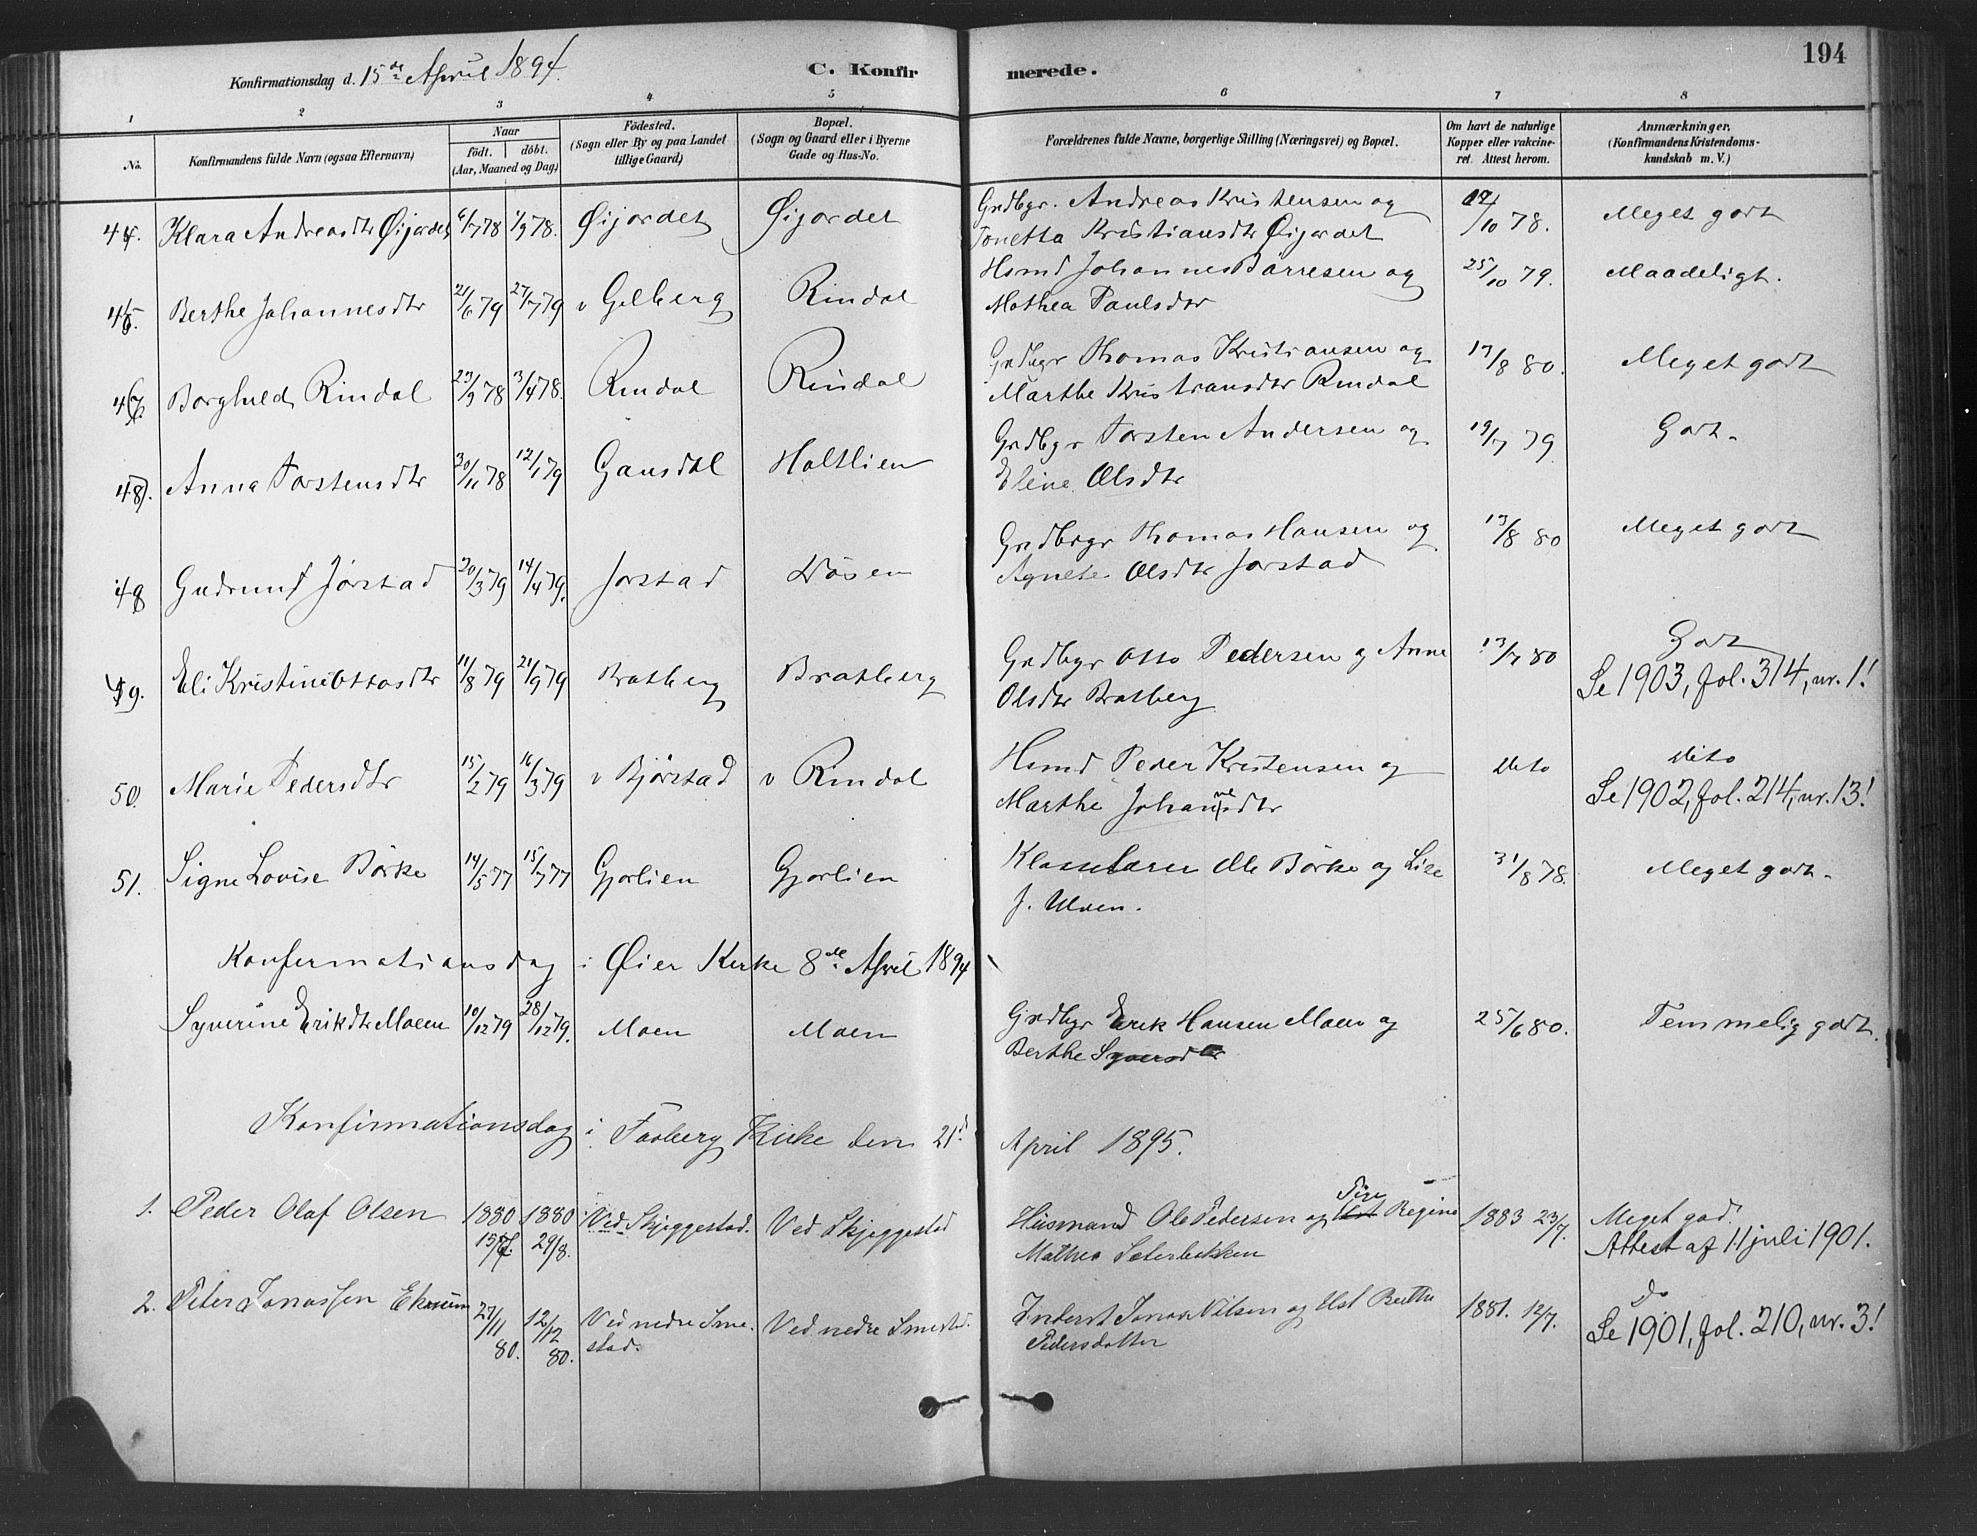 SAH, Fåberg prestekontor, Ministerialbok nr. 9, 1879-1898, s. 194